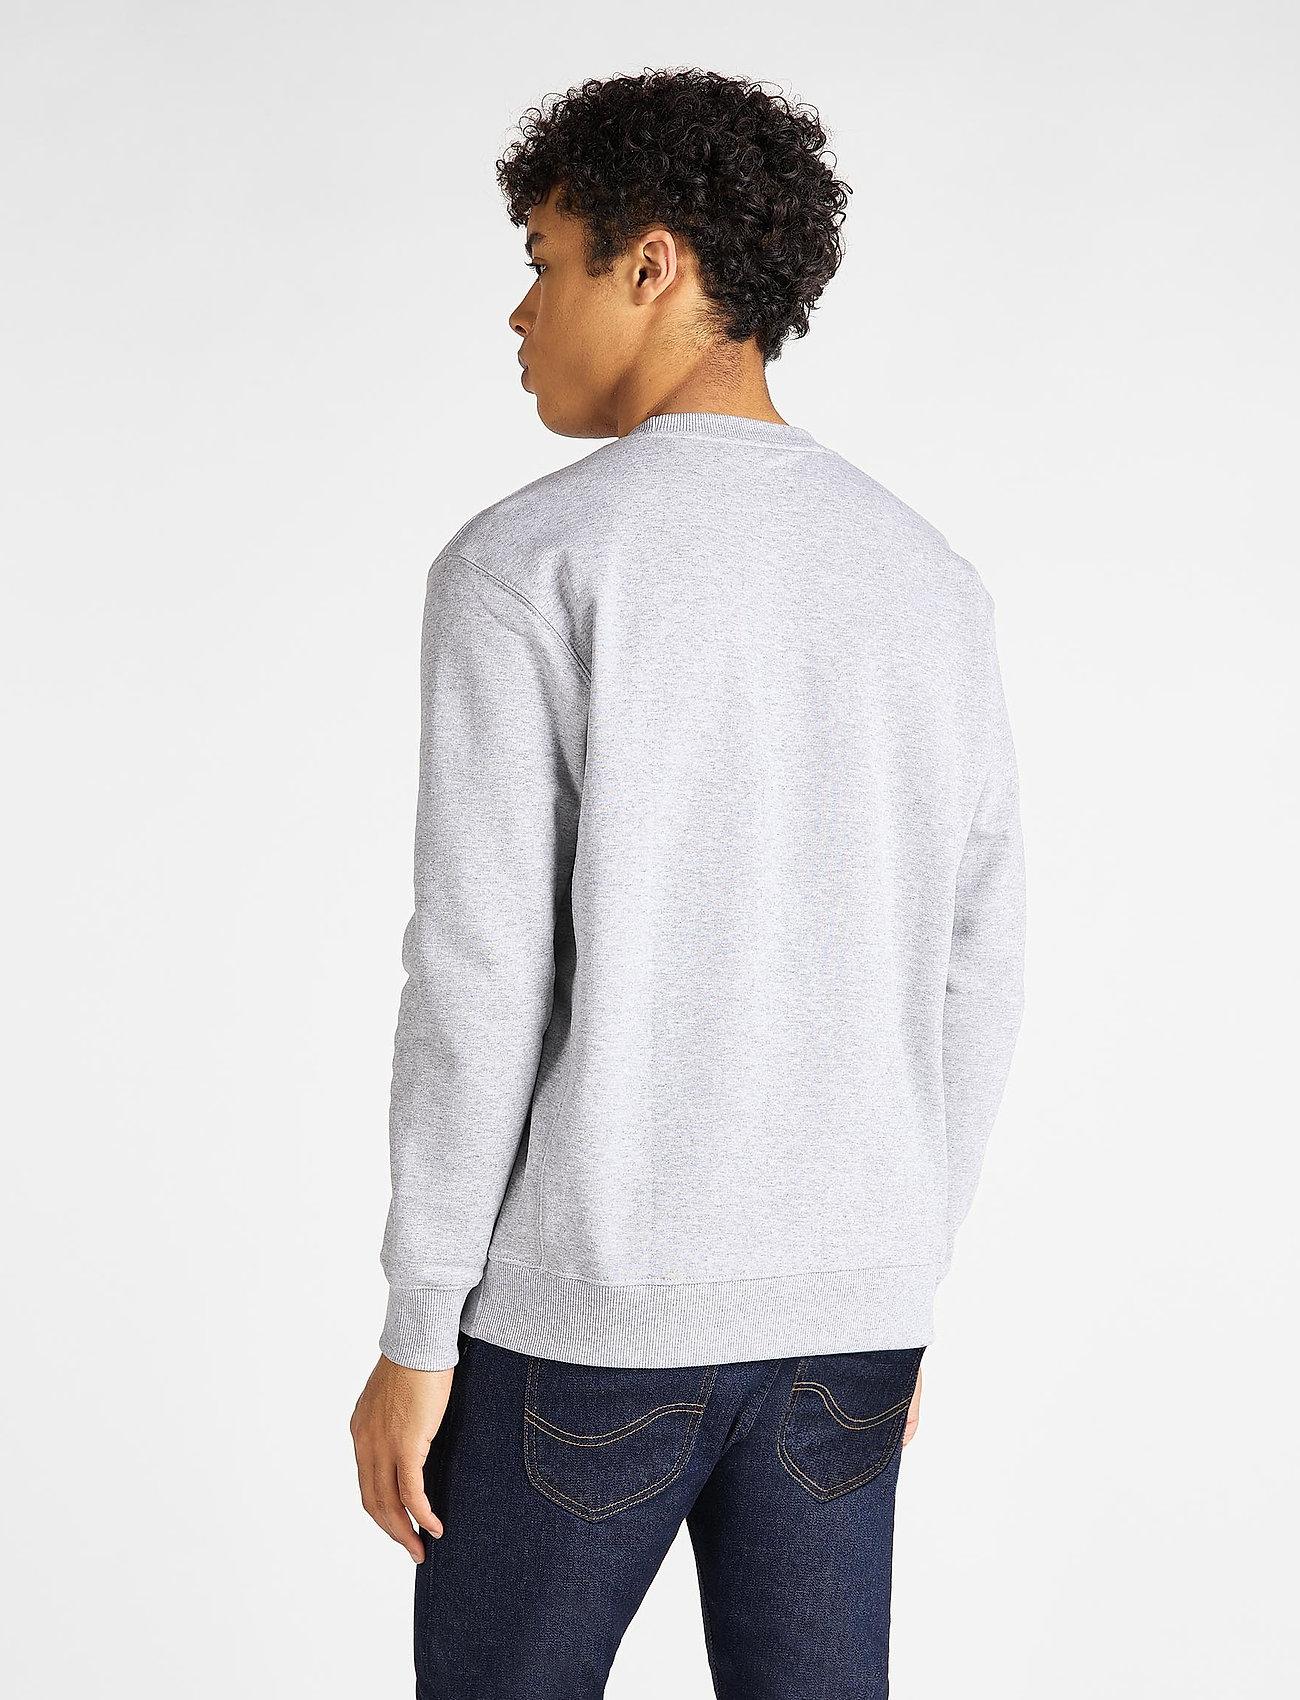 Lee Jeans PLAIN CREW SWS - Sweatshirts GREY MELE - Menn Klær